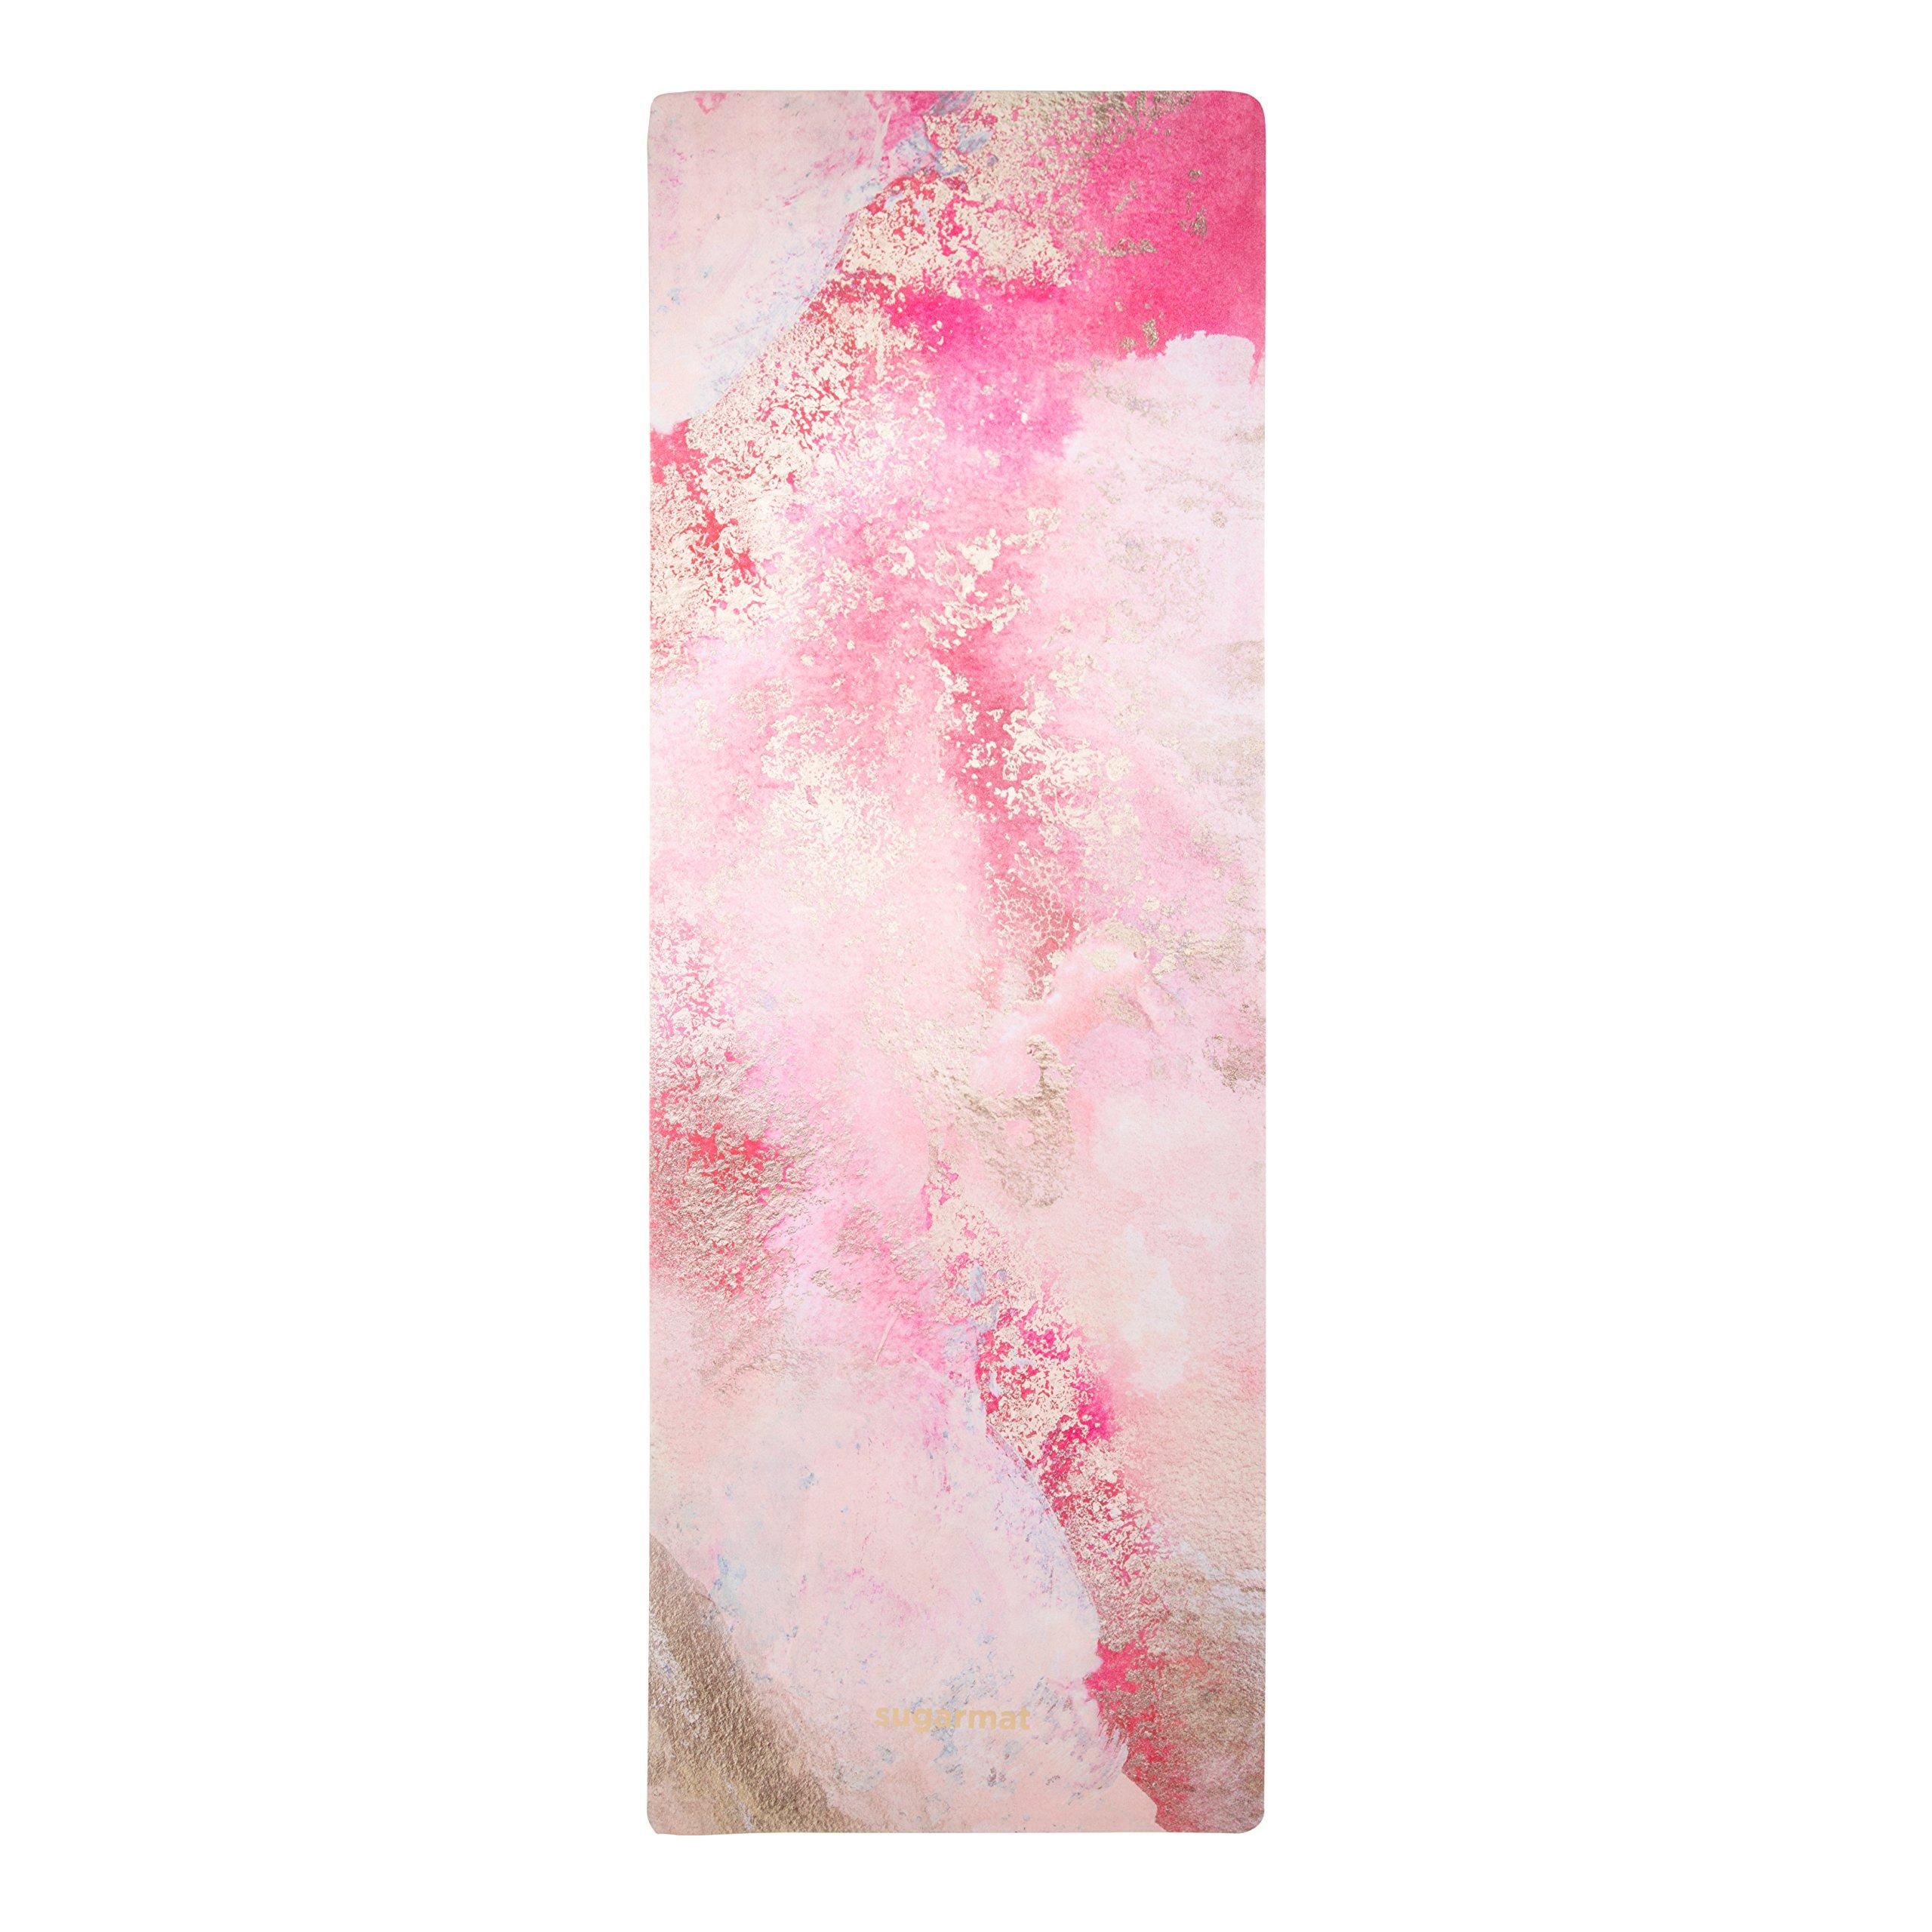 ''Love Affair'' Designer Yoga Mat by Sugarmat I Eco Luxury and Non-slip I Designed in Montreal I Ideal for Yoga, hot yoga, Pilates I Machine washable I Non-faded color I Include yoga strap by Sugarmat